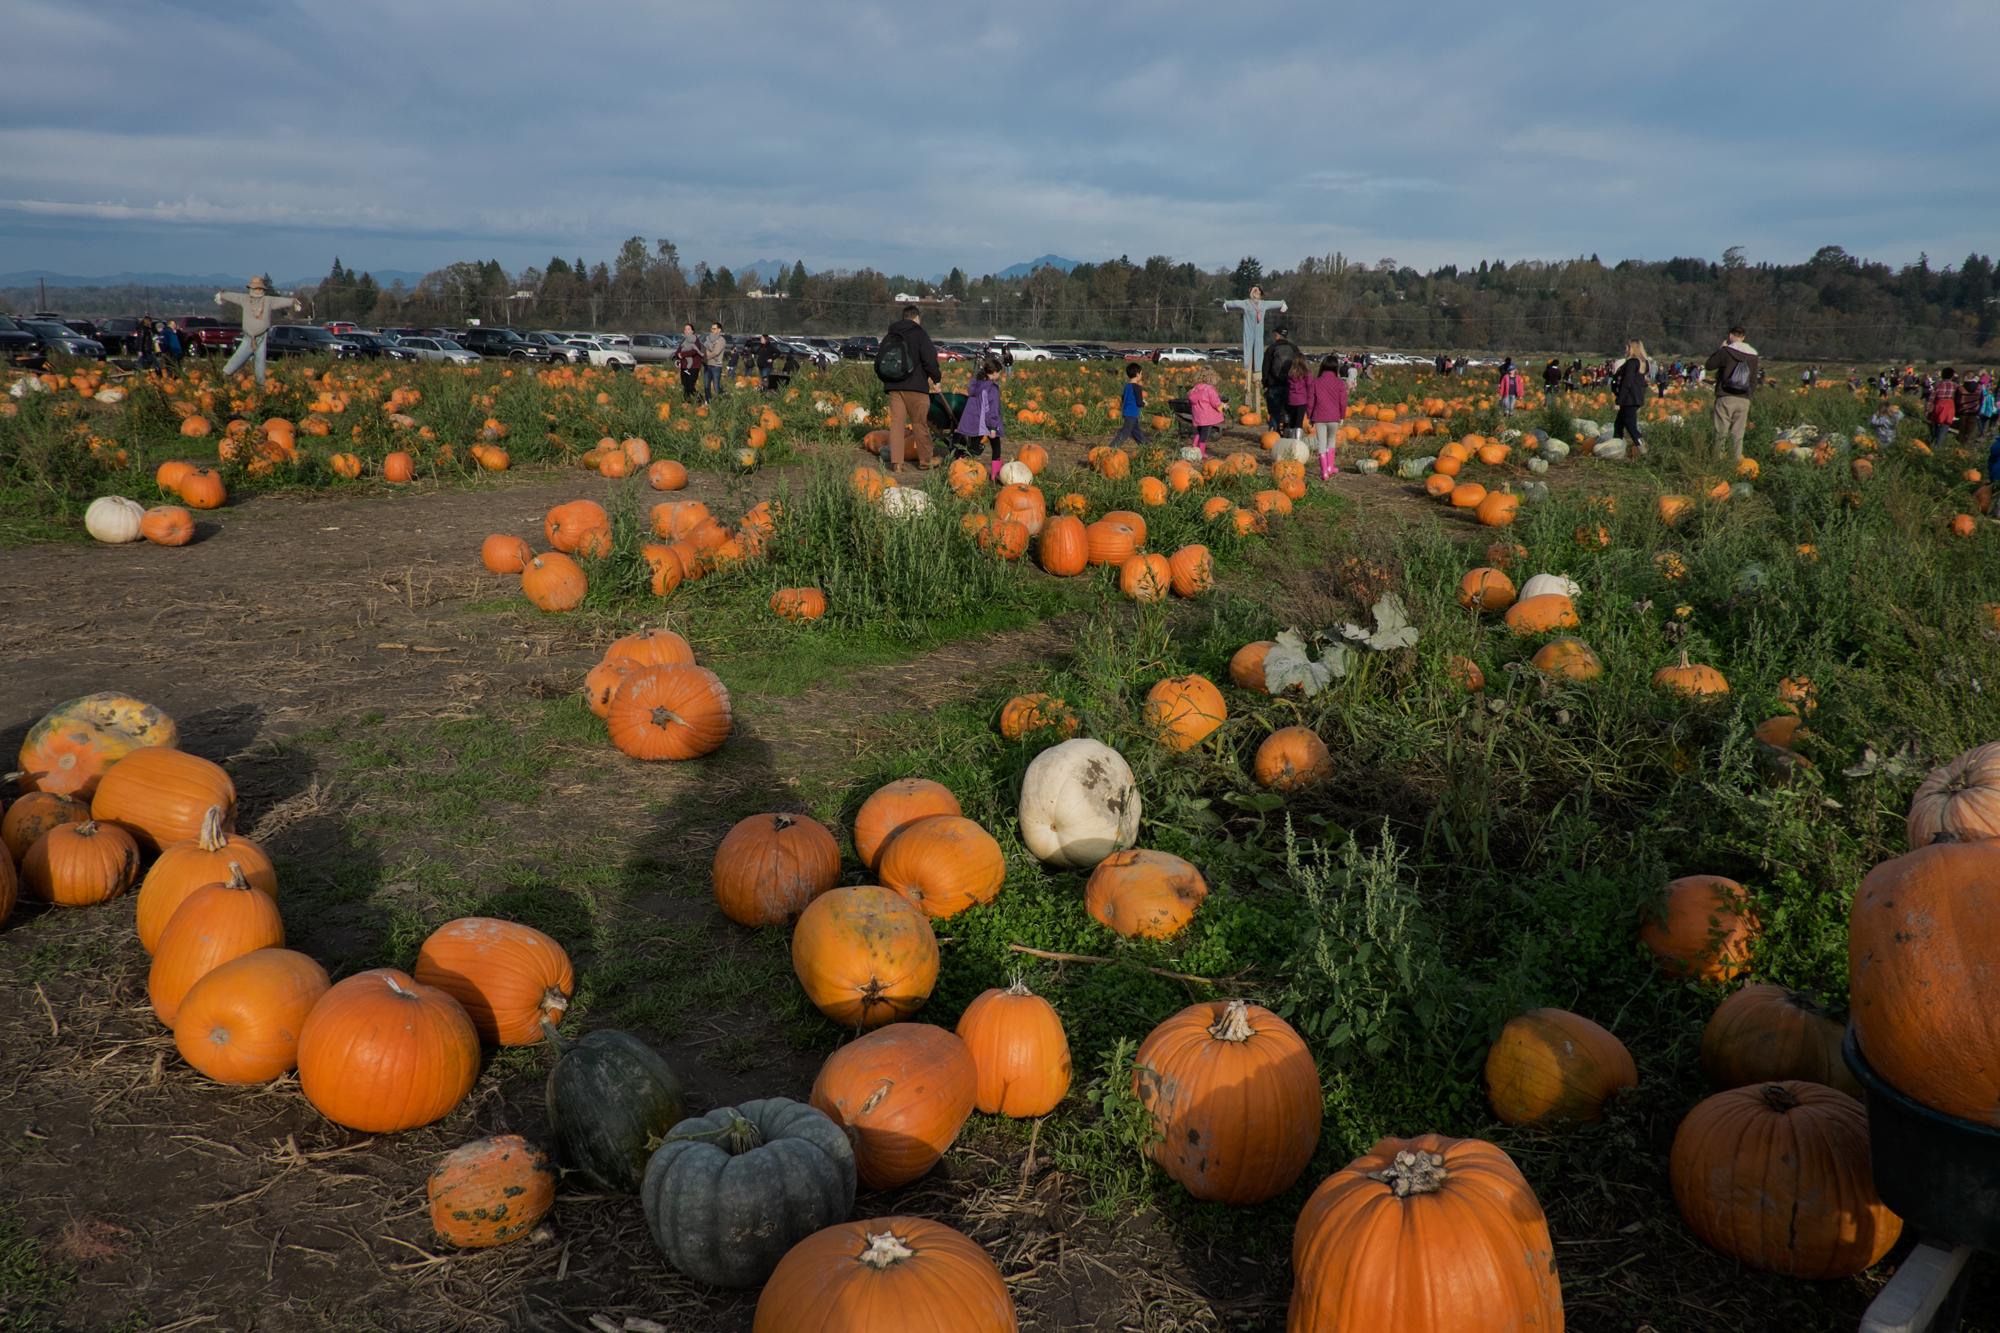 Selfie at the Pumpkin Picking at Craven Farm, Snohomish, Washington